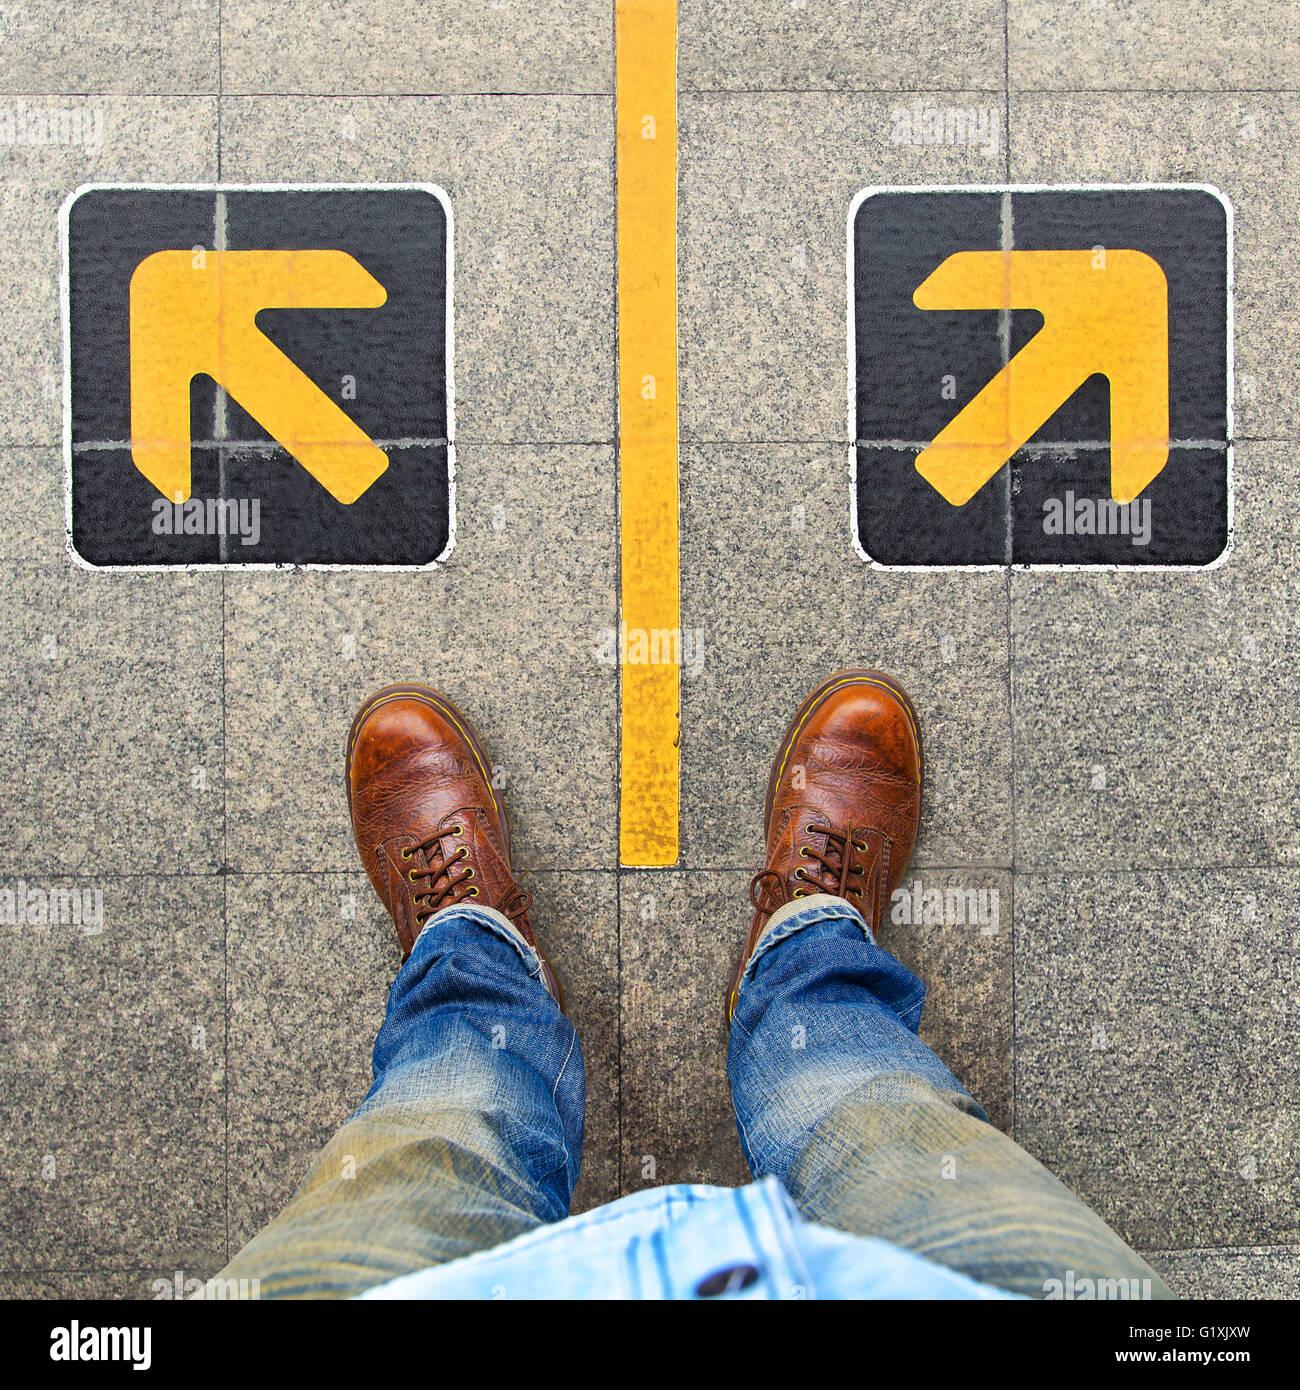 Verwirrung, Richtung, Pfeil Stockbild